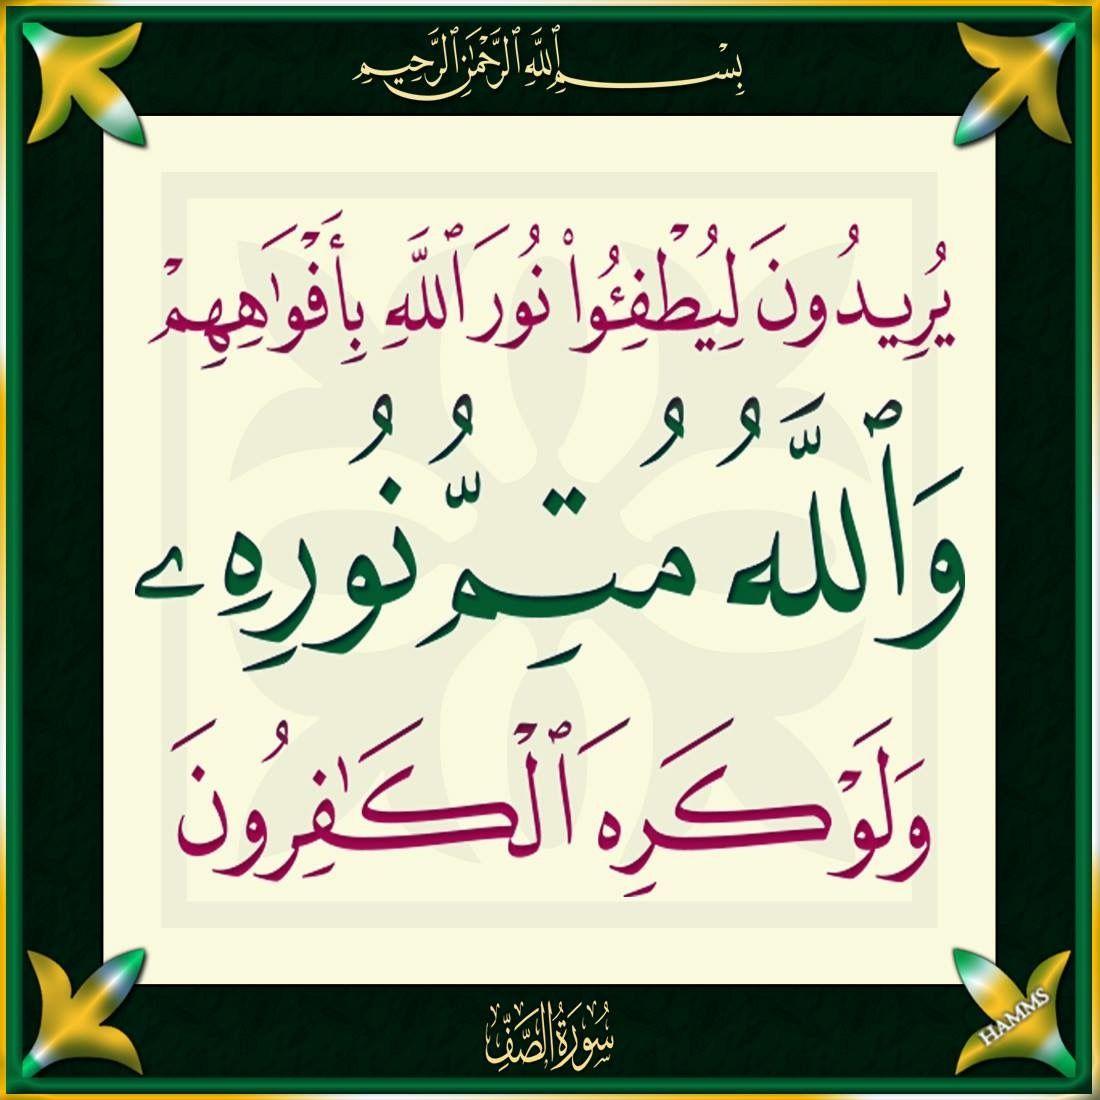 ٨ الصف Arabic Calligraphy Focal Point Inspirational Quotes